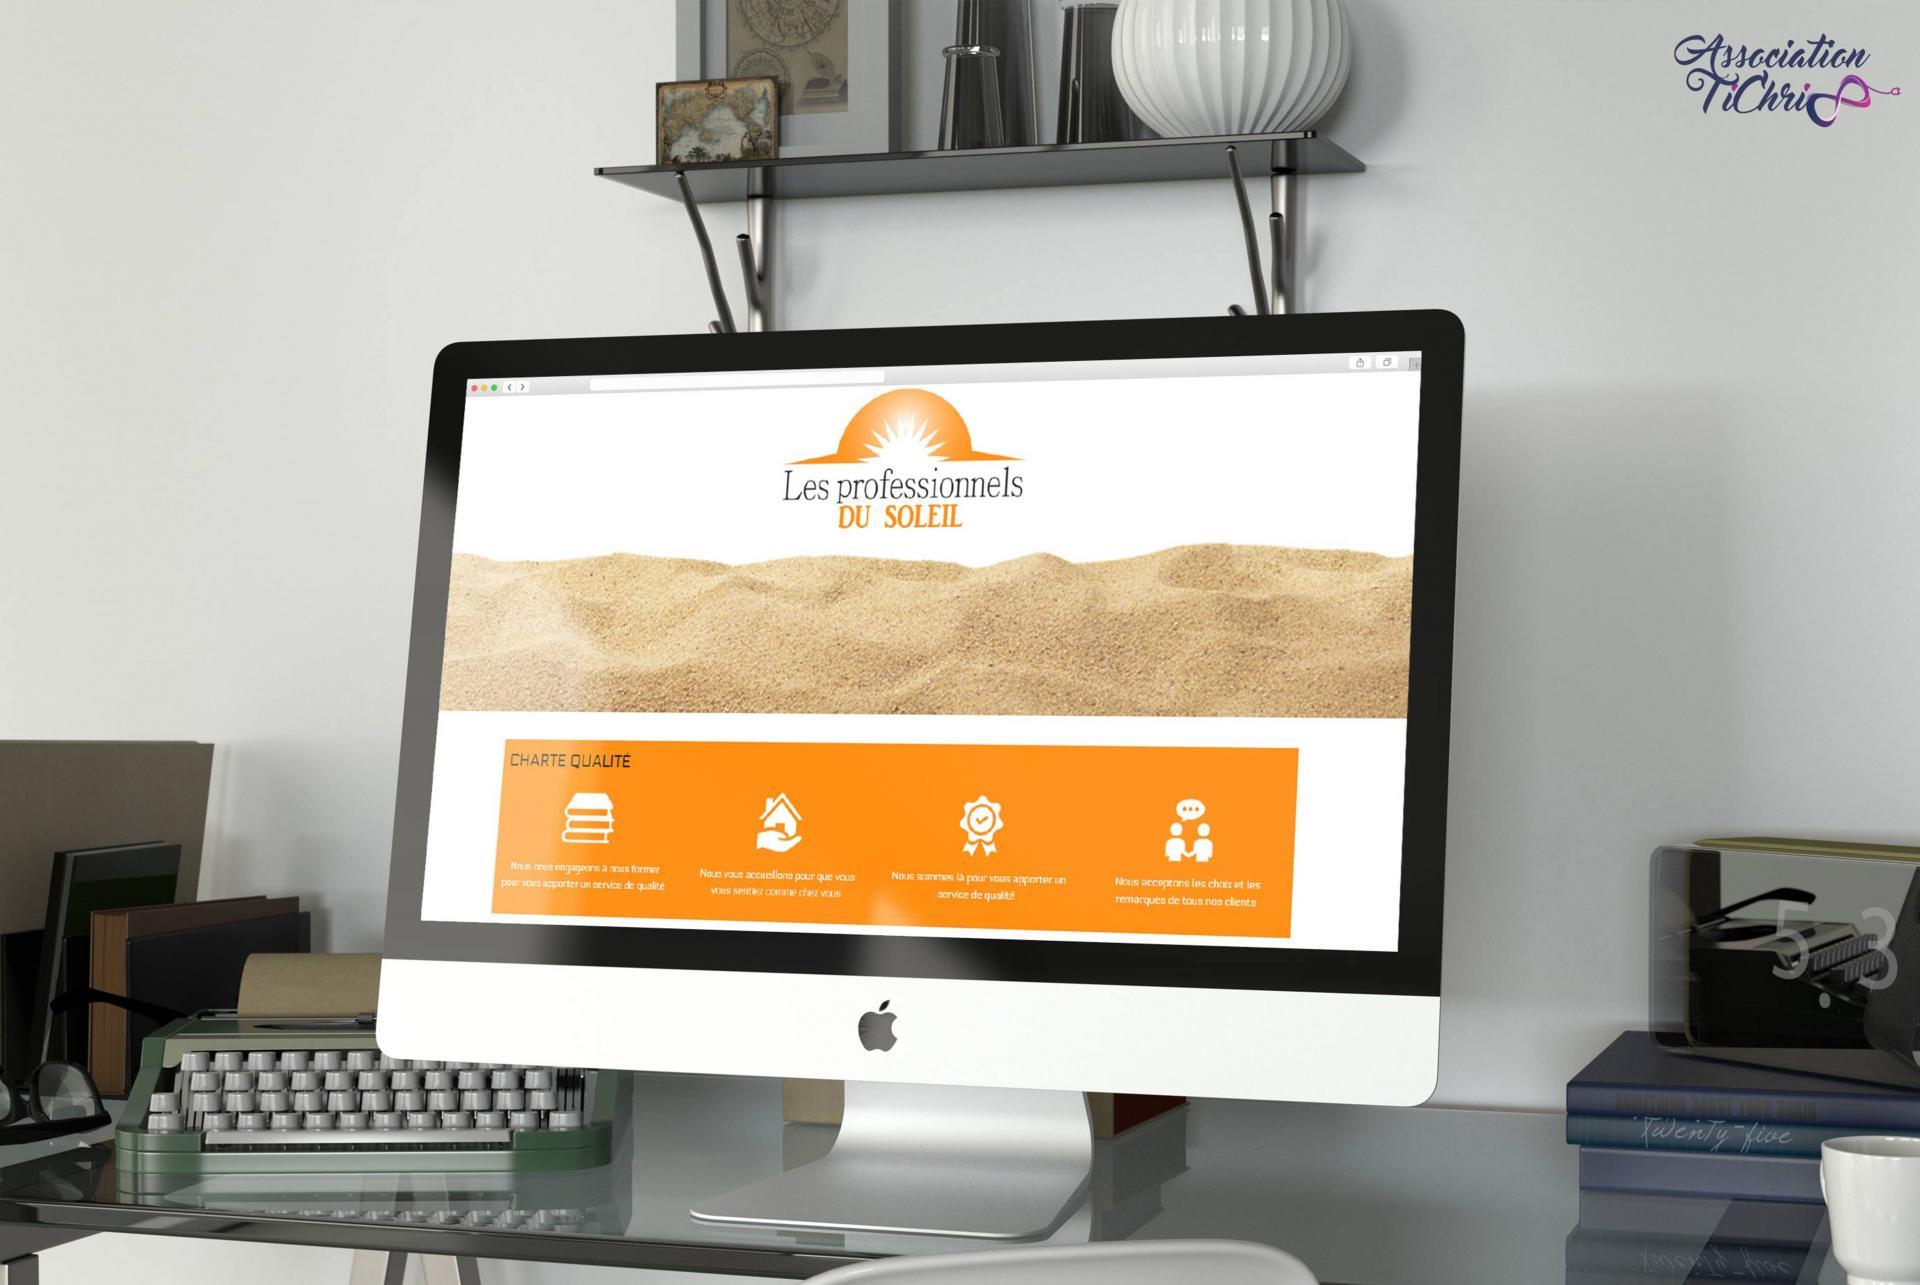 Centre de formation site web tichri44